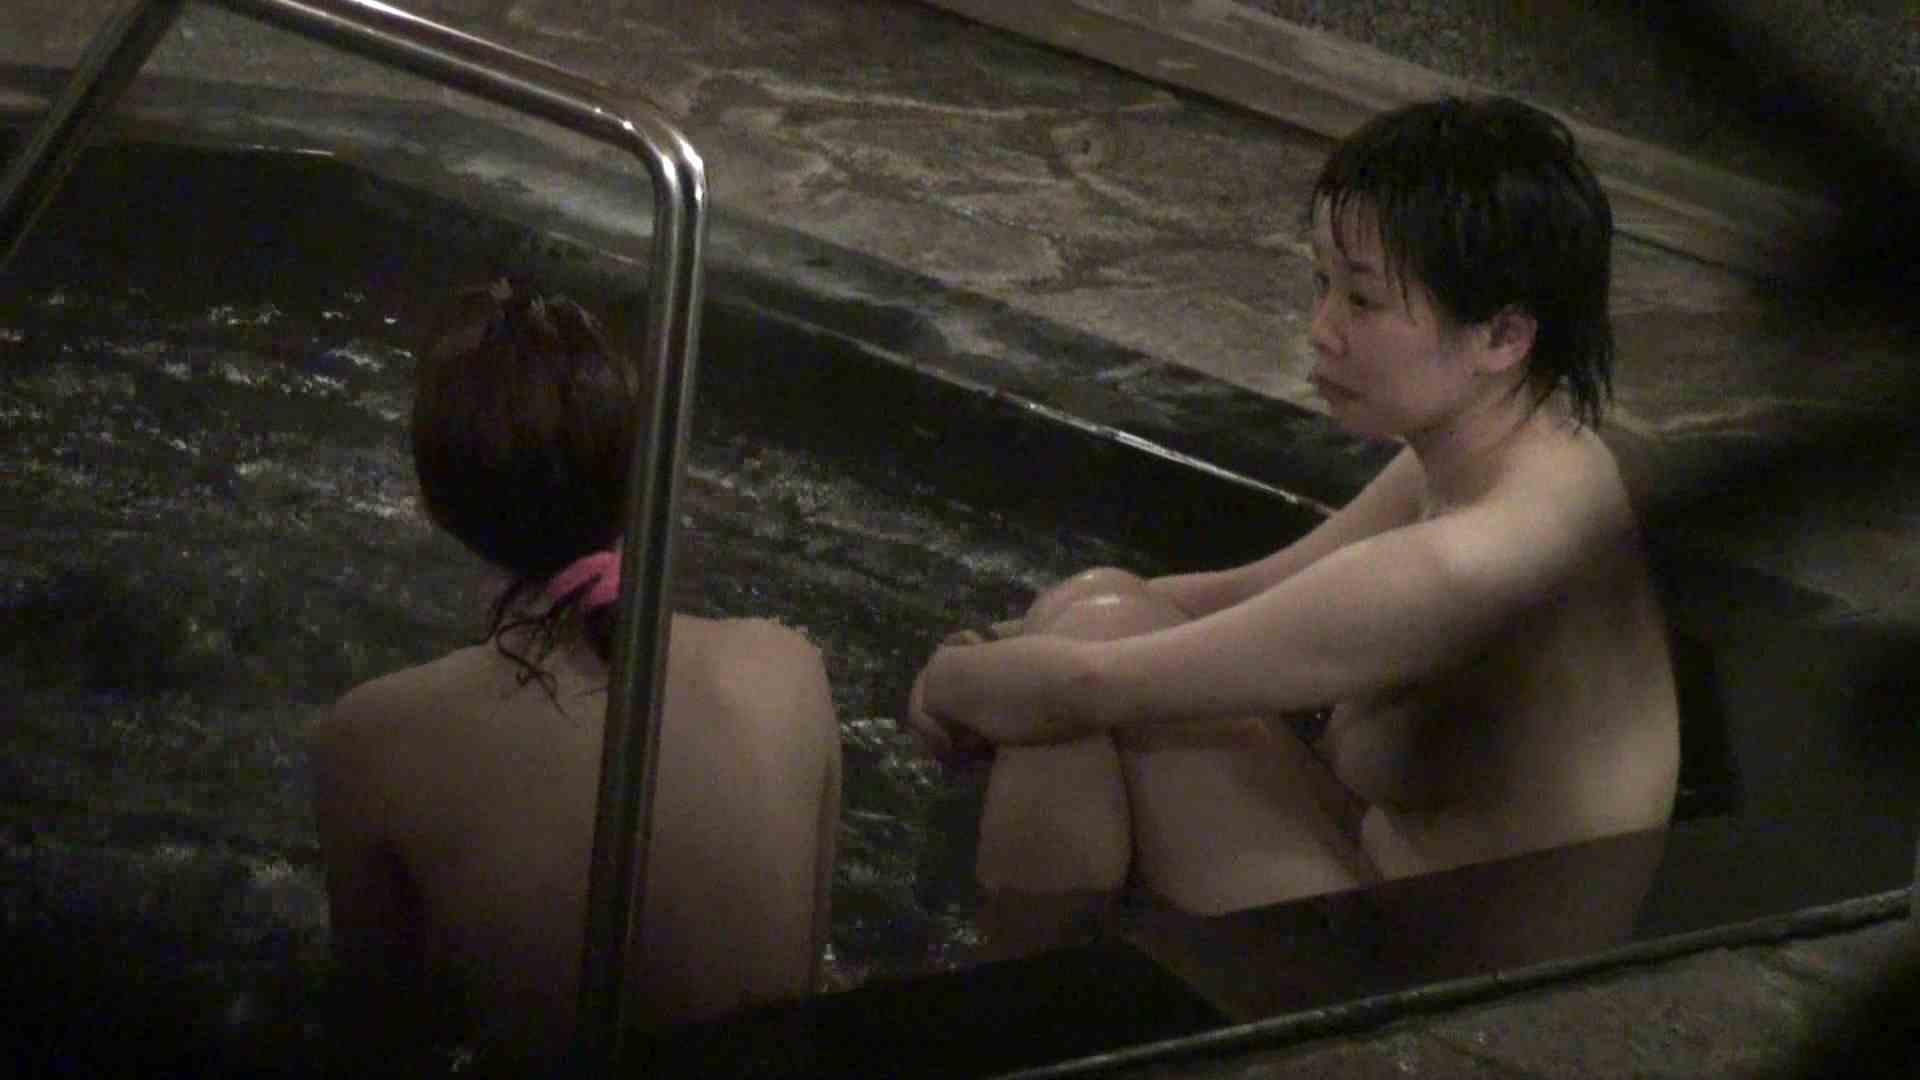 Aquaな露天風呂Vol.394 盗撮 | OLセックス  99画像 94